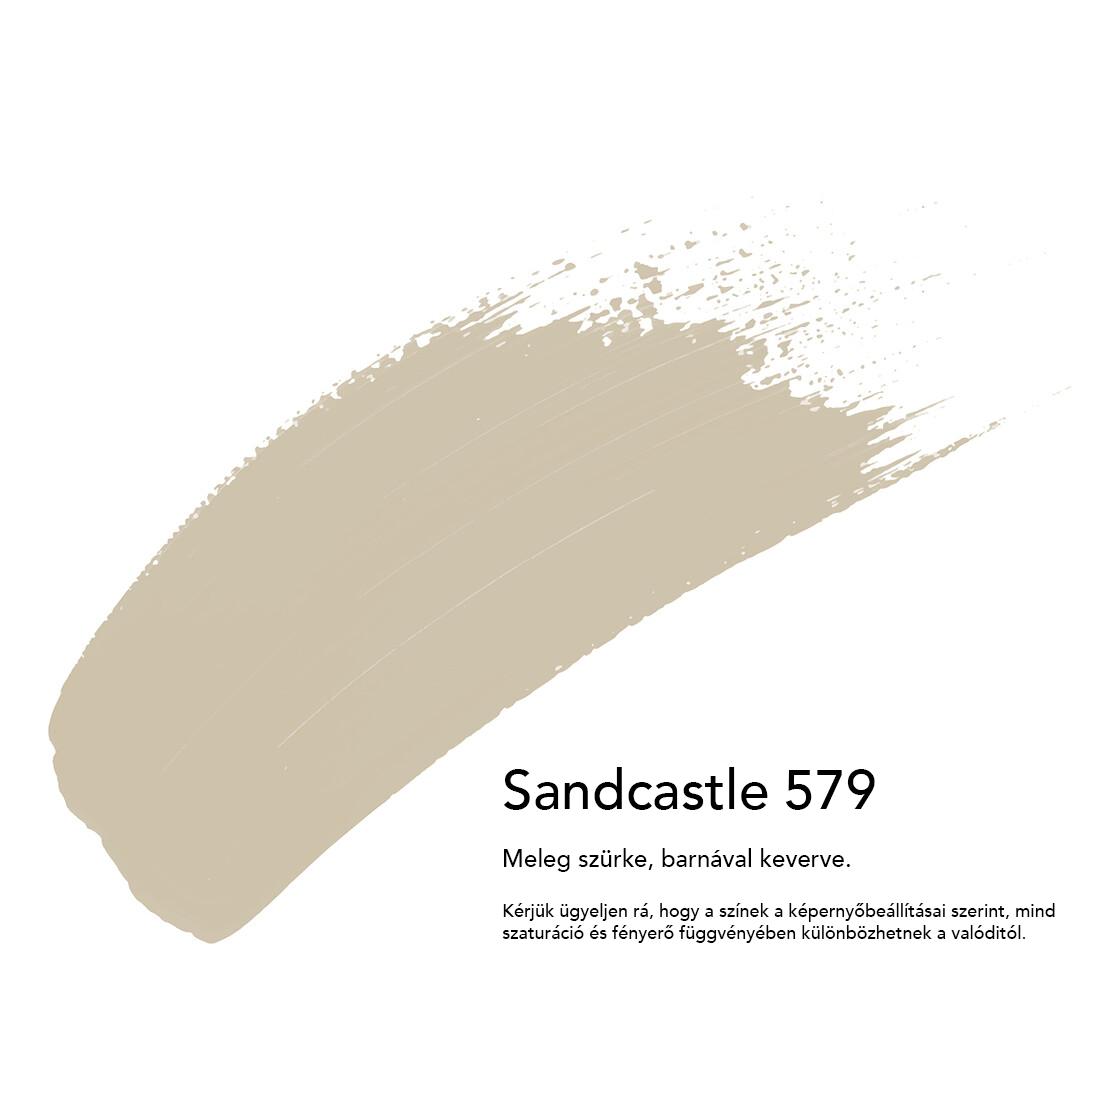 sadcastle